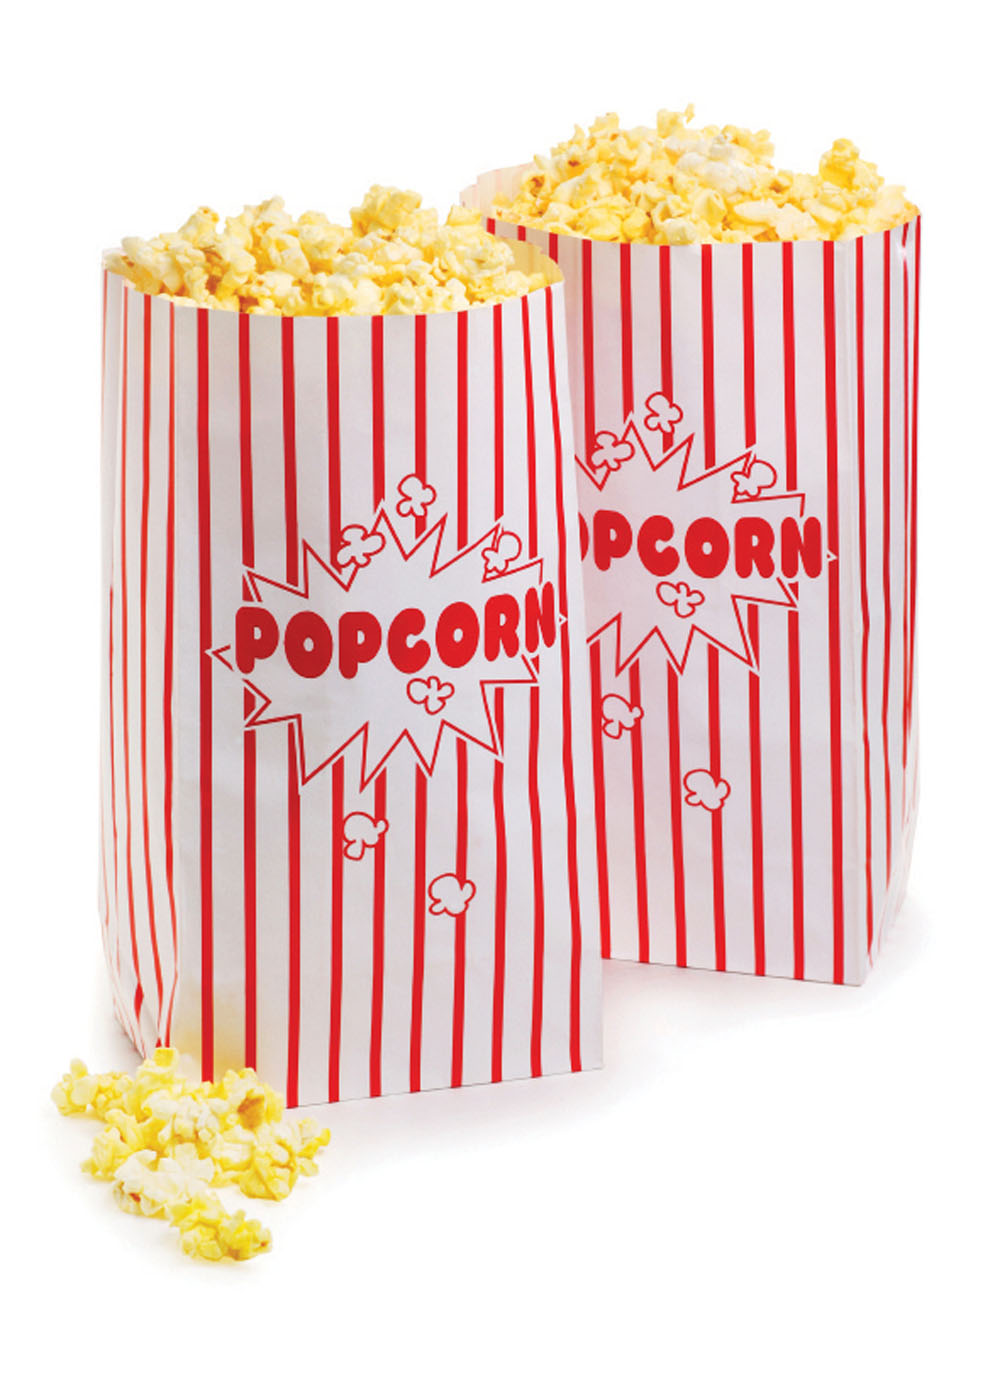 14 Popcorn Clip Art Free